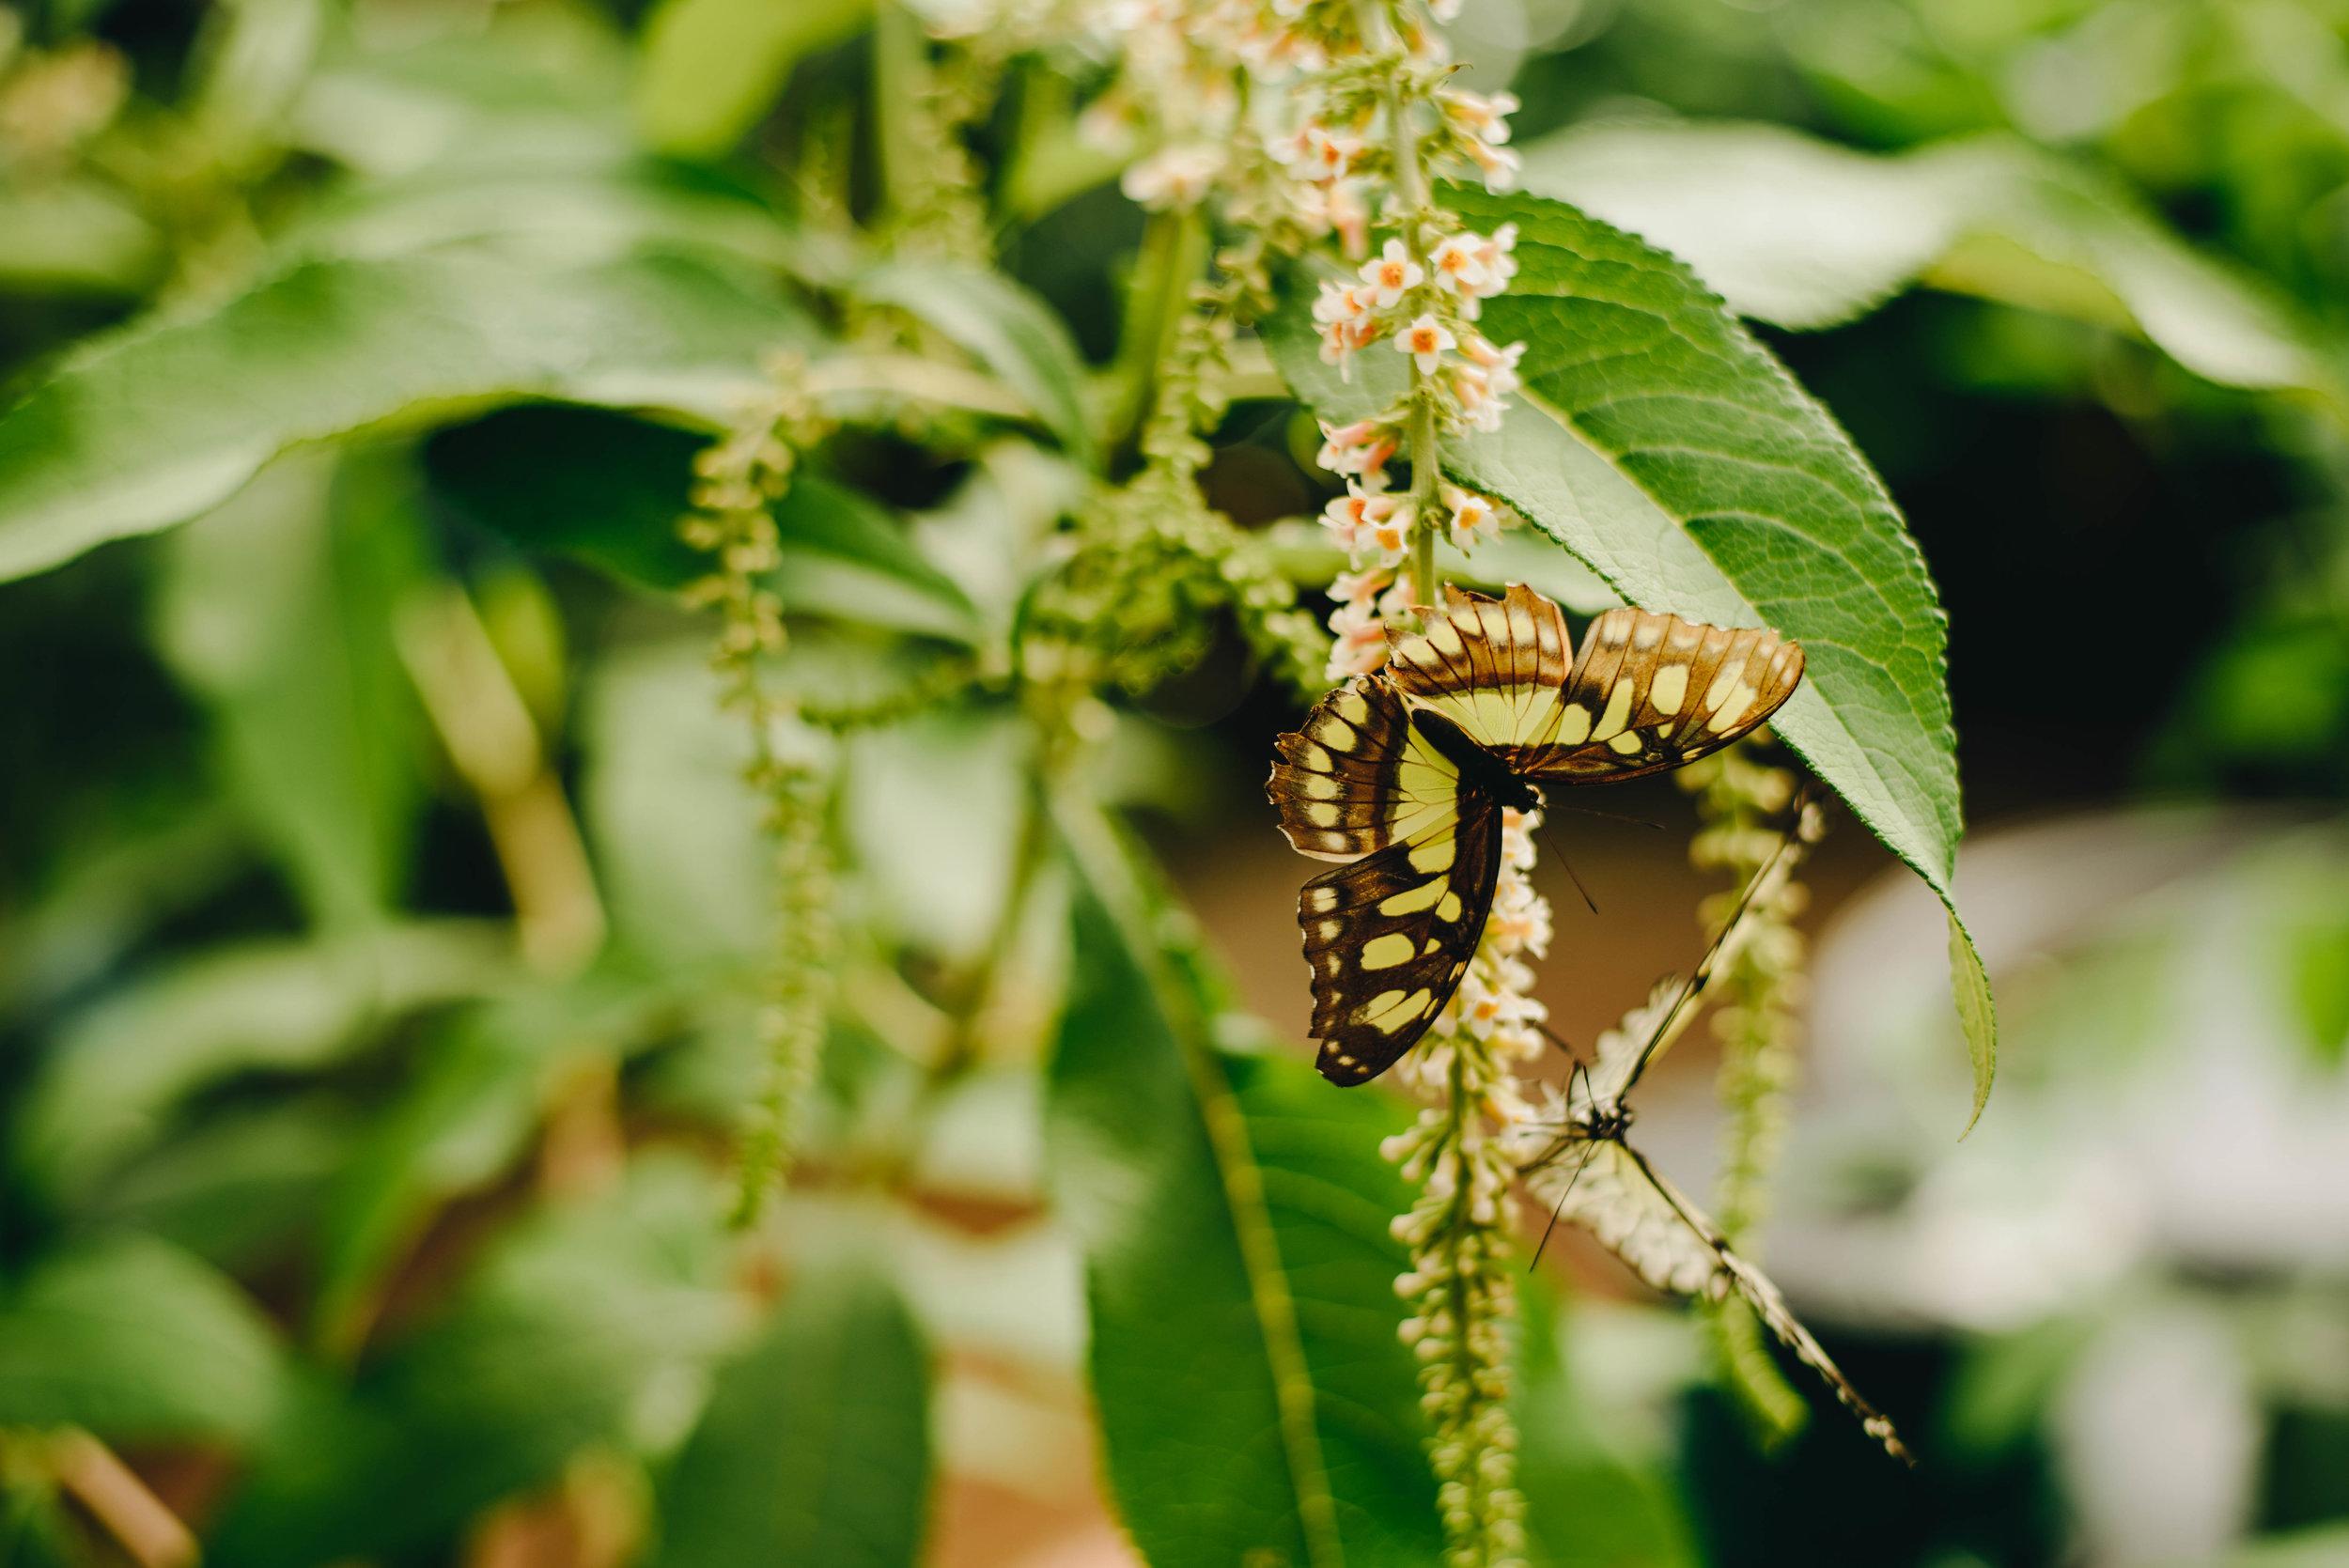 BotanicGardens-0070.jpg